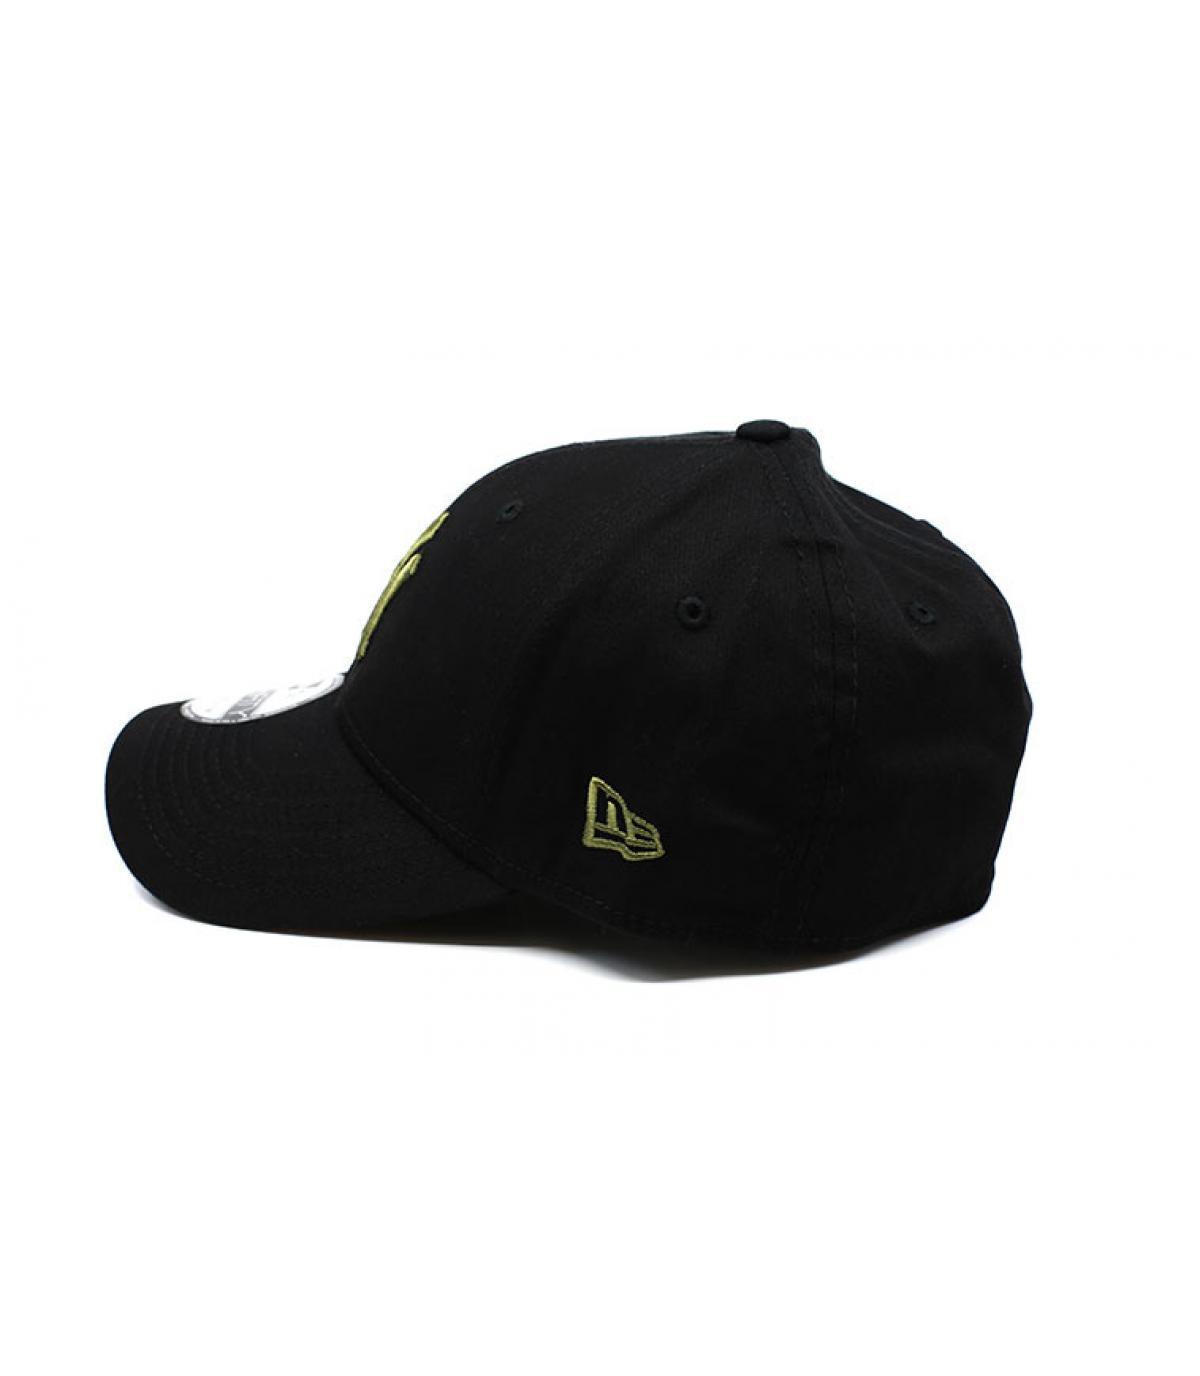 Dettagli League Ess NY 39Thirty black olive - image 4